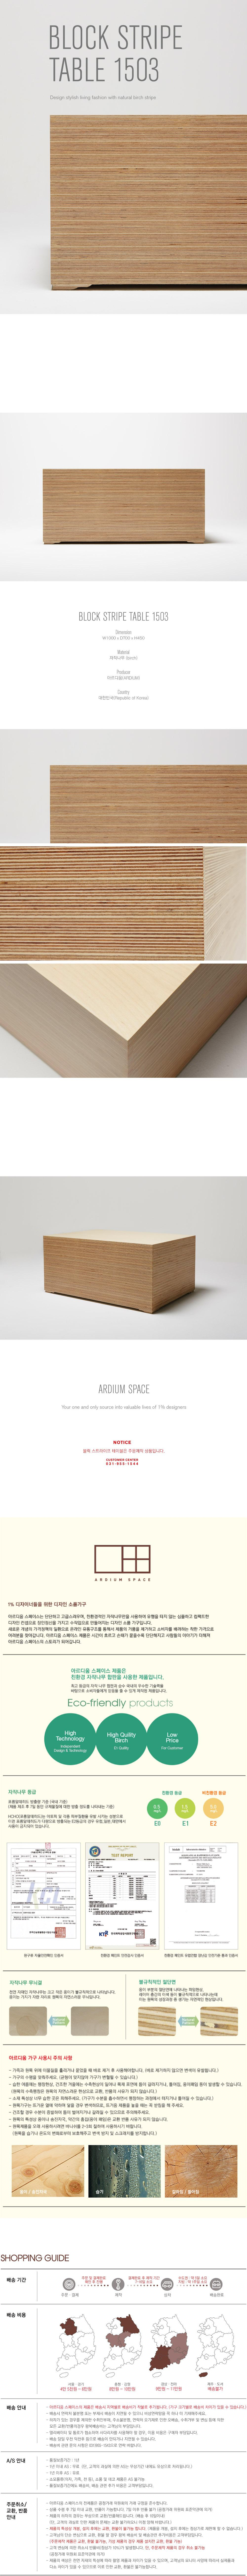 Block Stripe table 1503